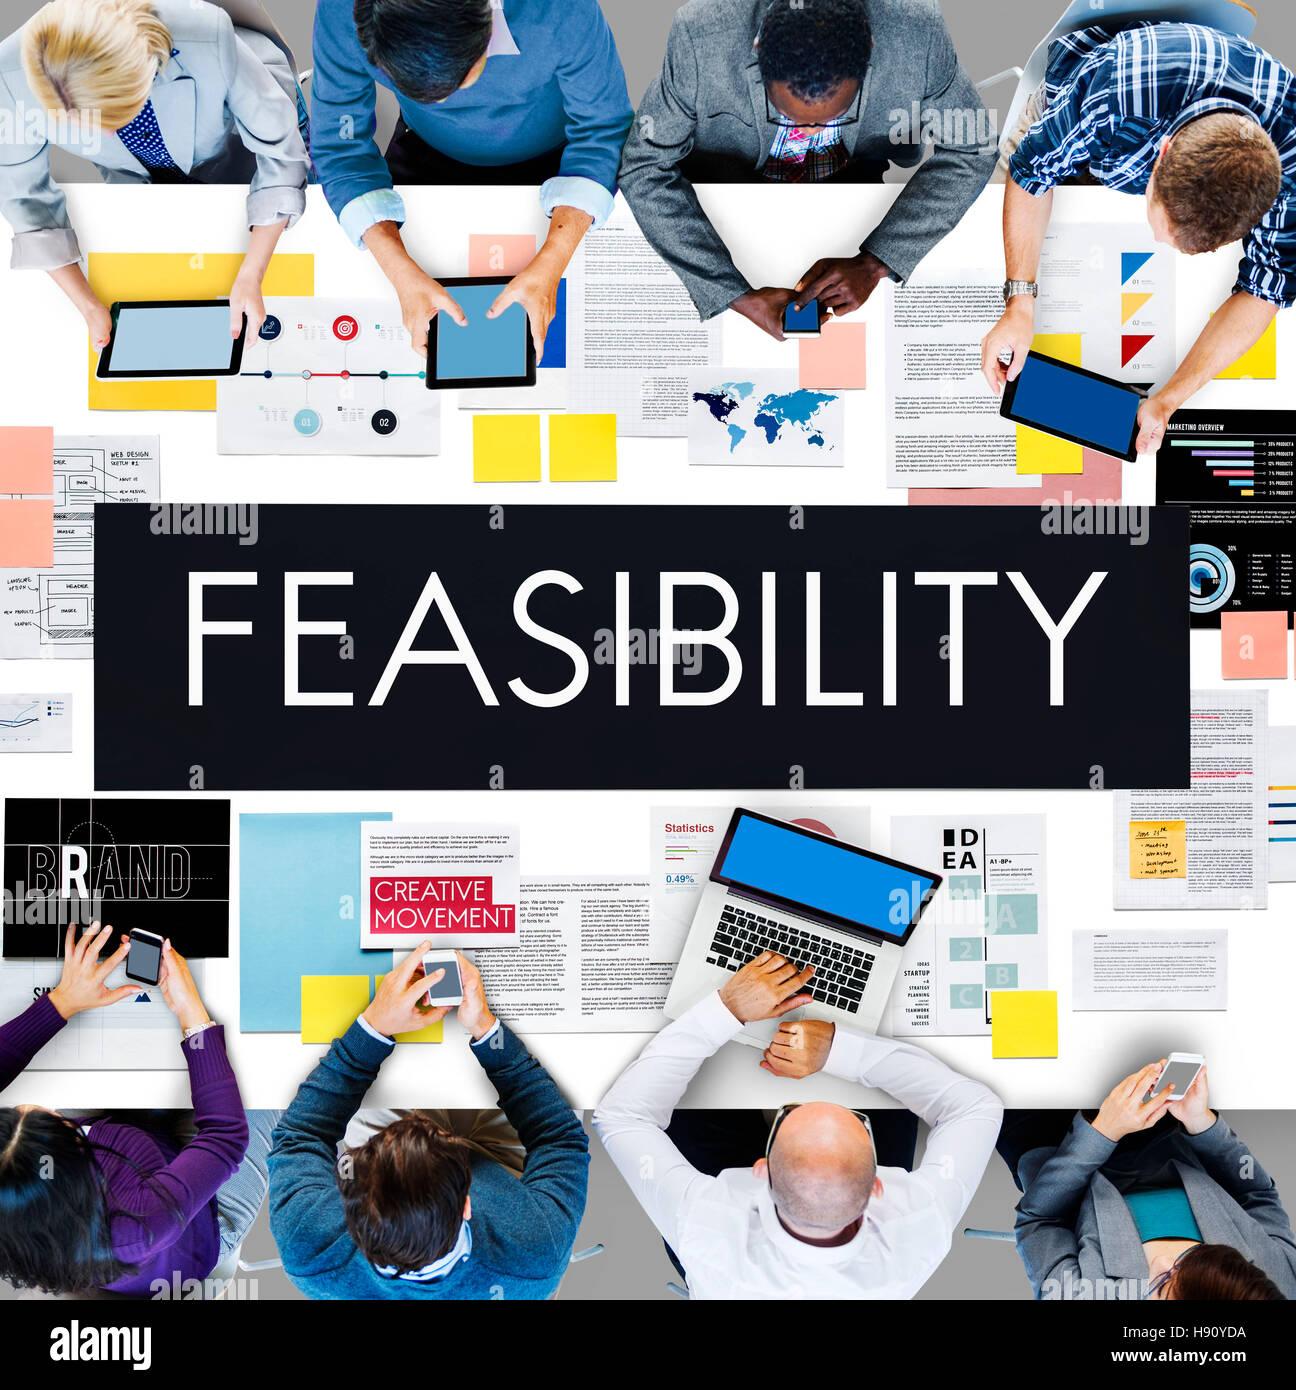 Feasibility Analysis Stock Photos Amp Feasibility Analysis Stock Images Alamy